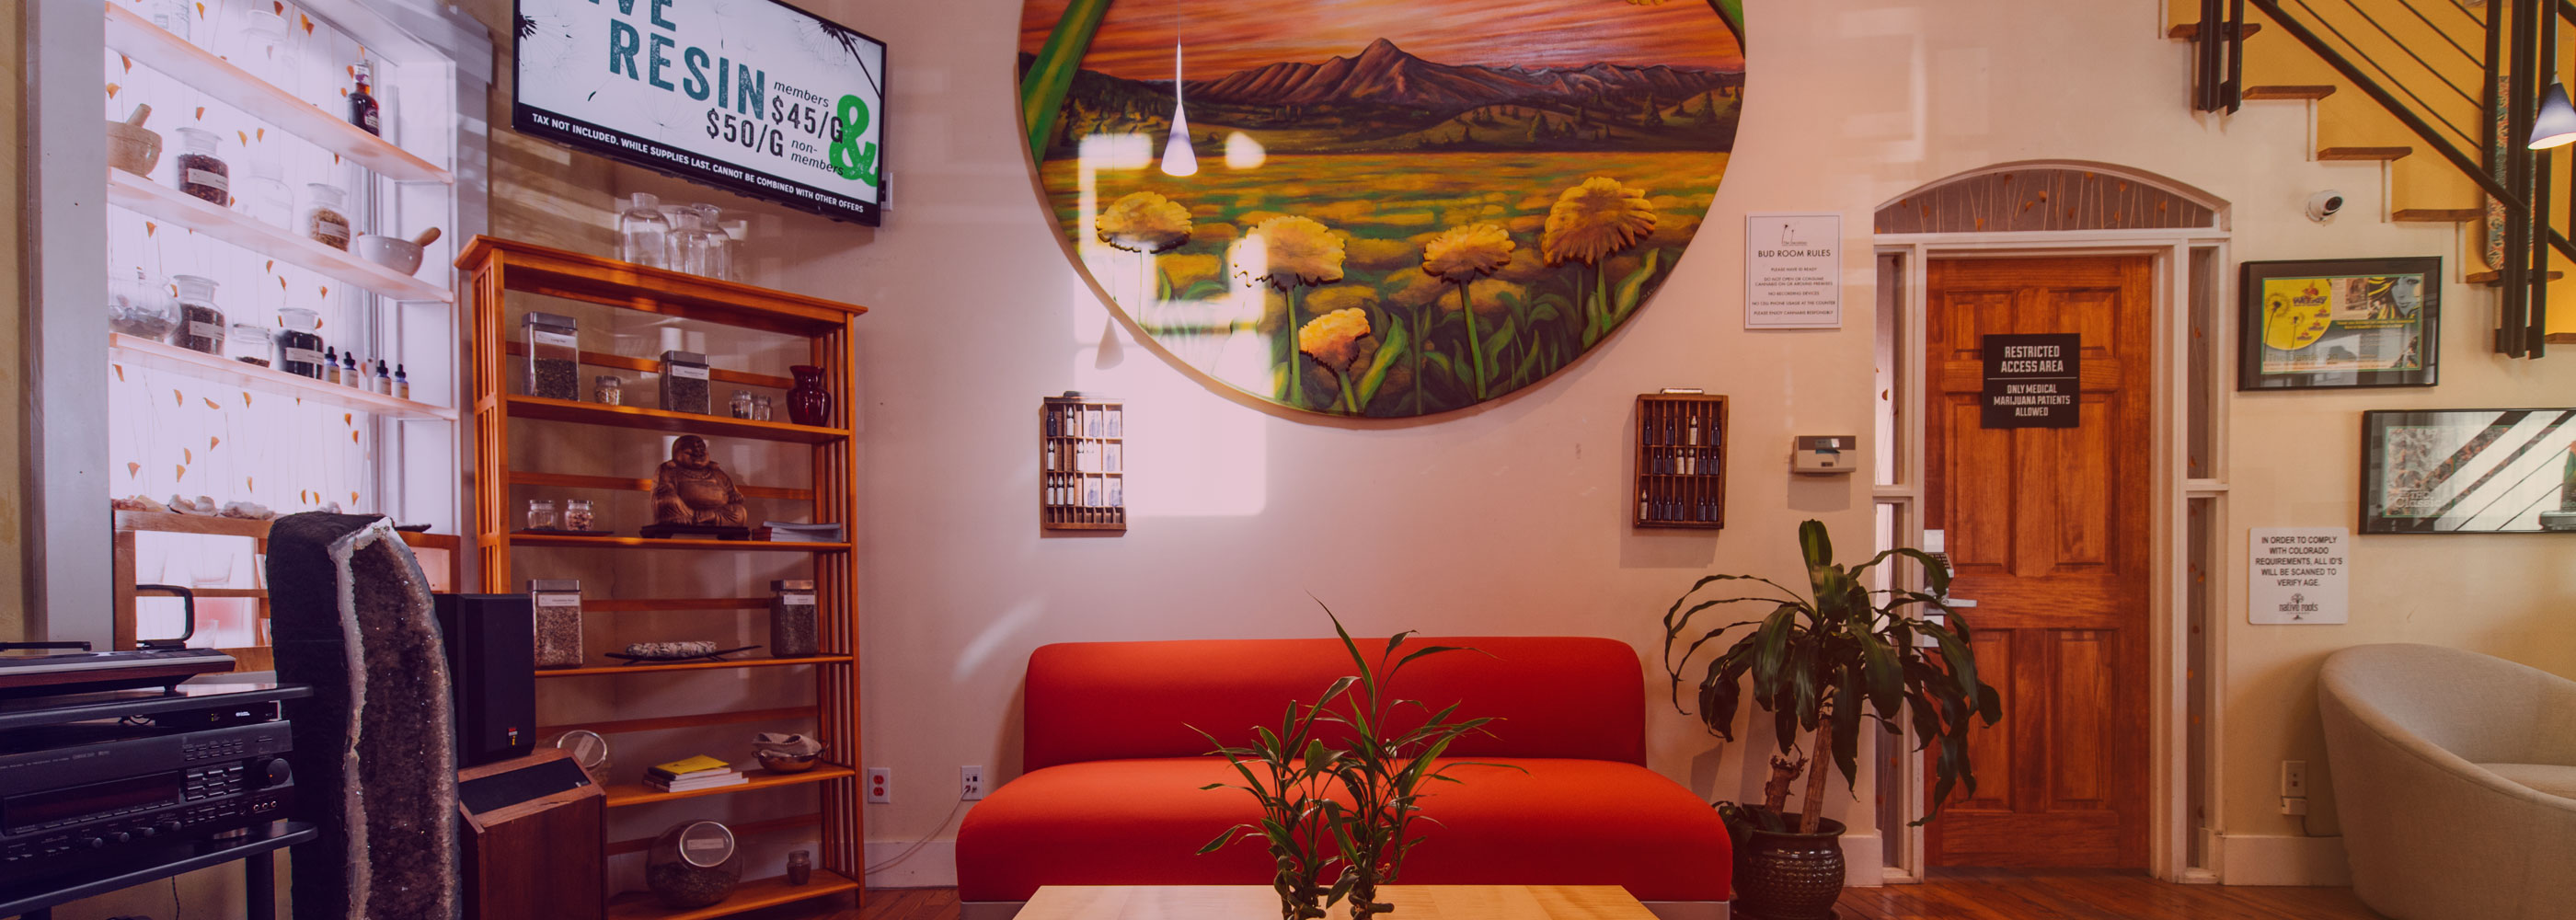 The Dandelion Marijuana Dispensary